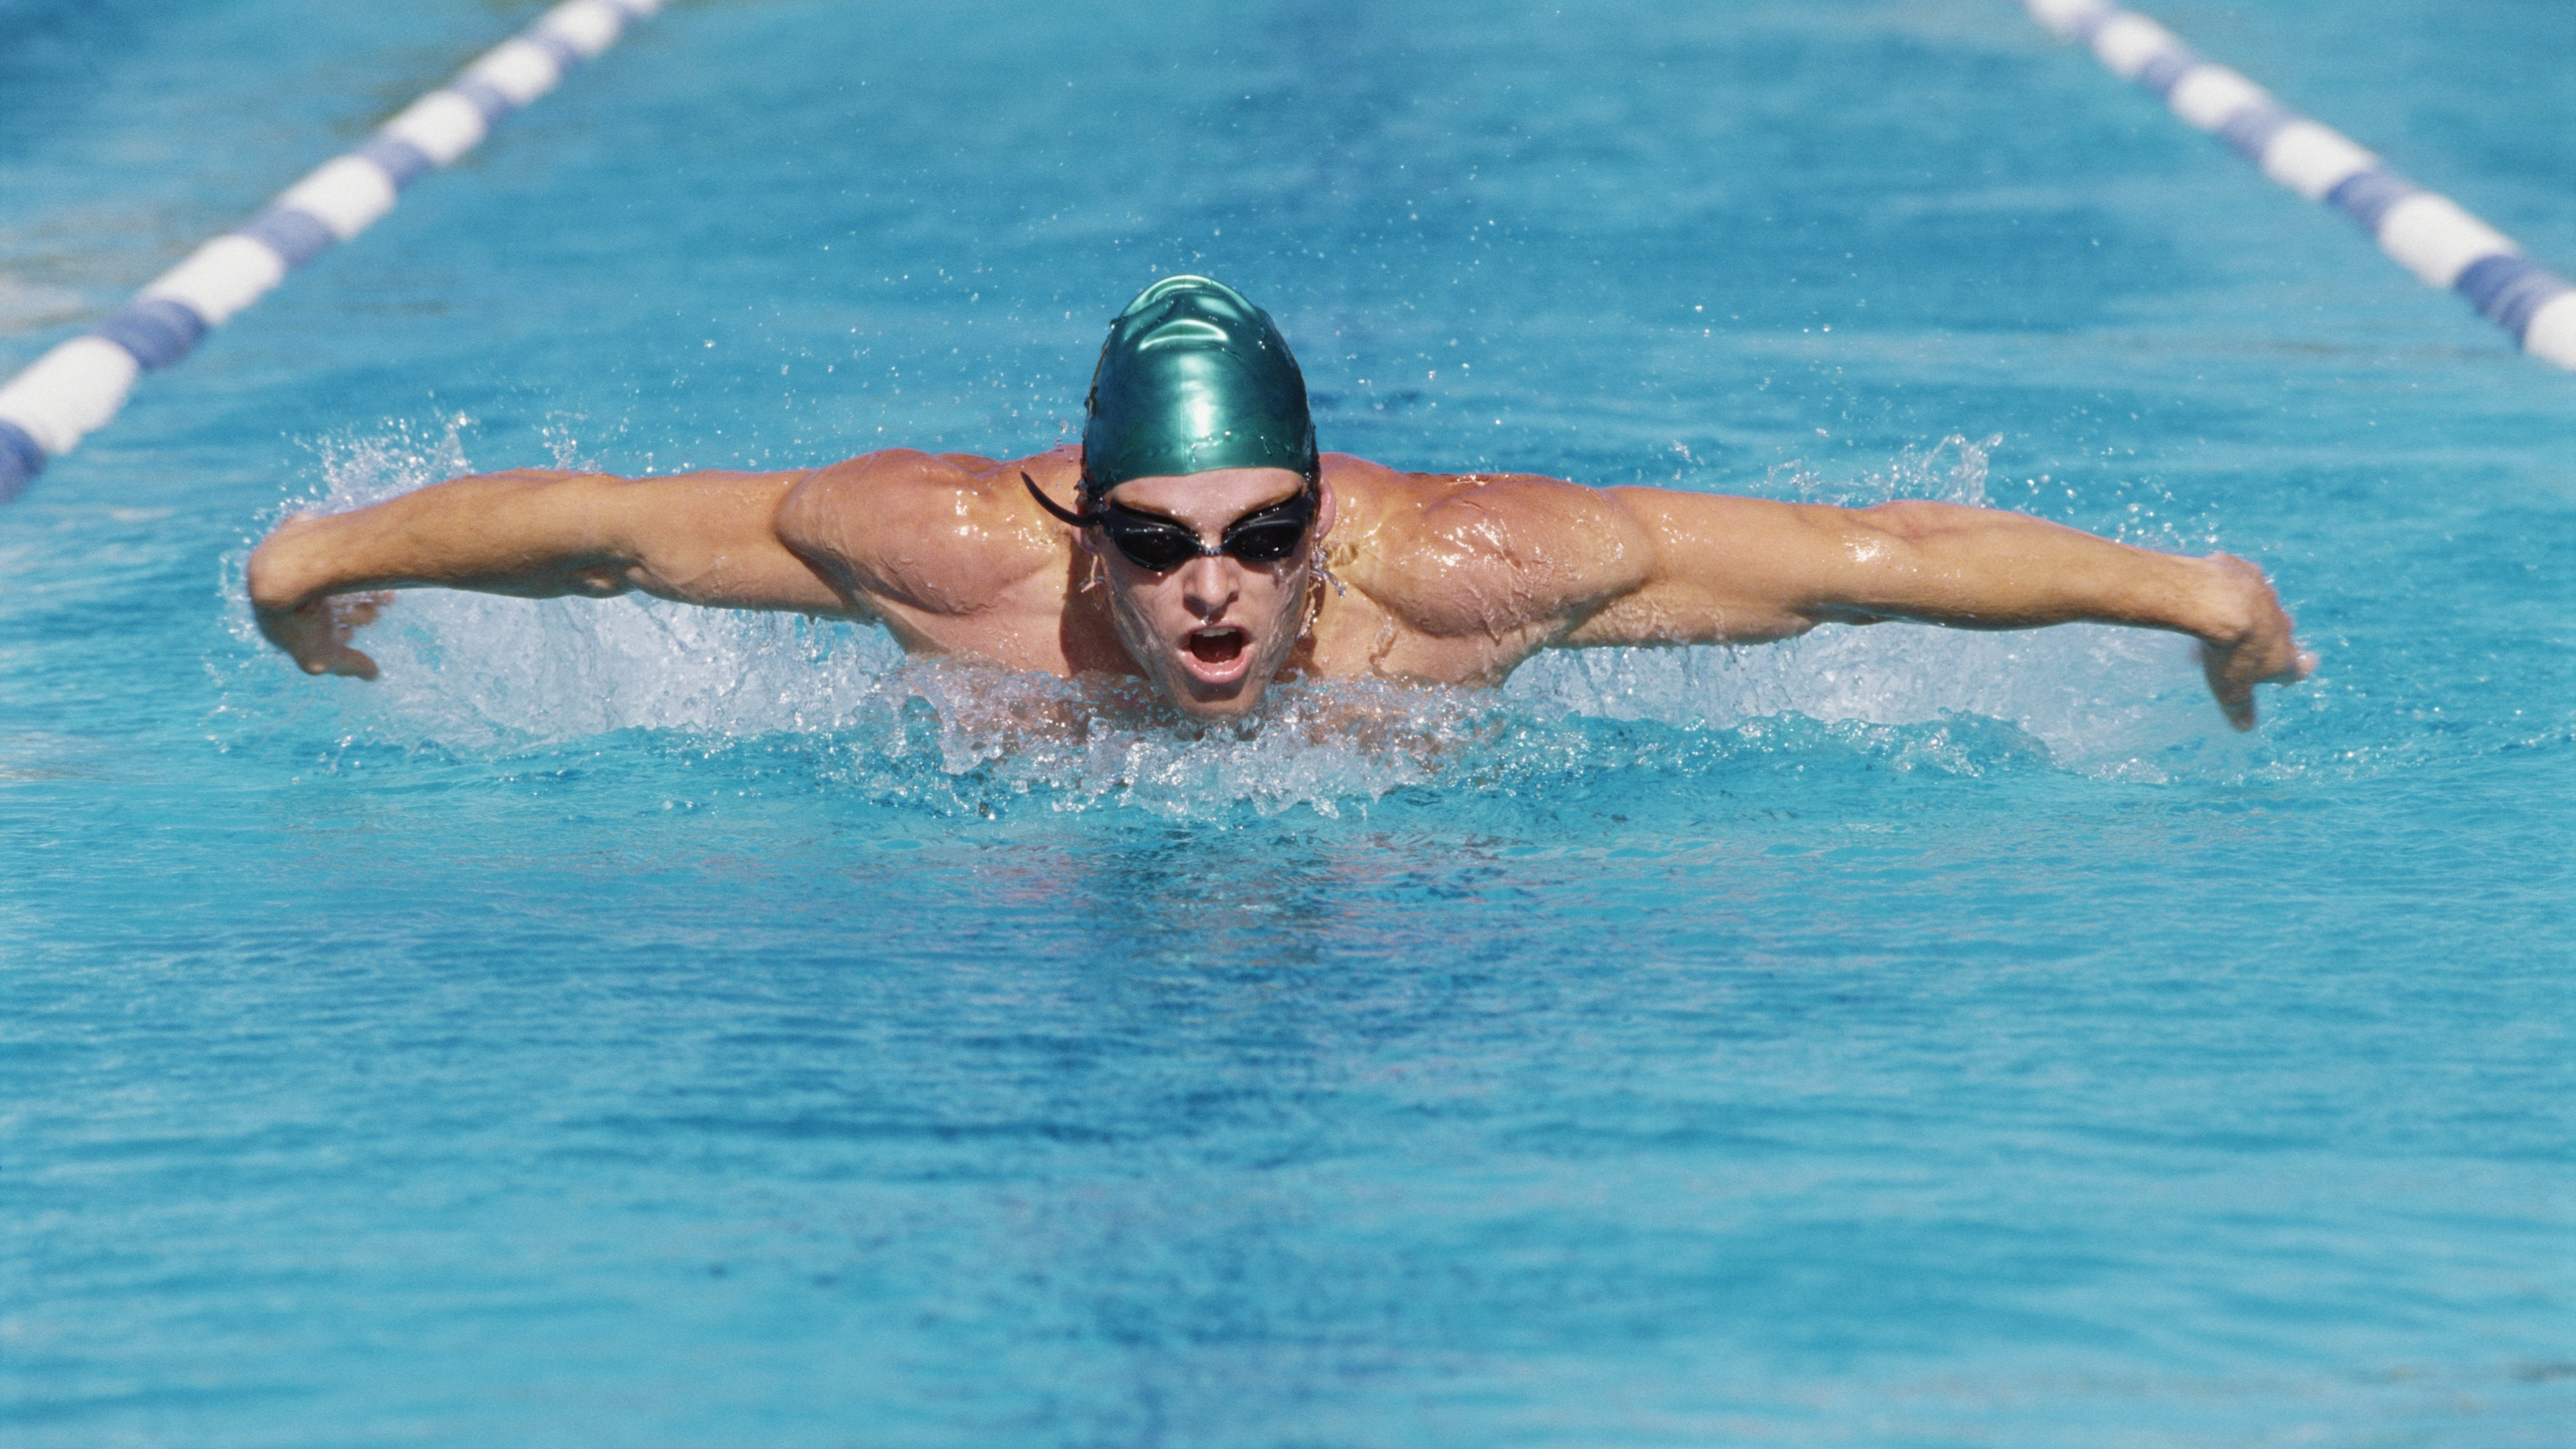 swimmer swimming pool swing 4k 1540063267 - swimmer, swimming pool, swing 4k - swing, swimming pool, swimmer